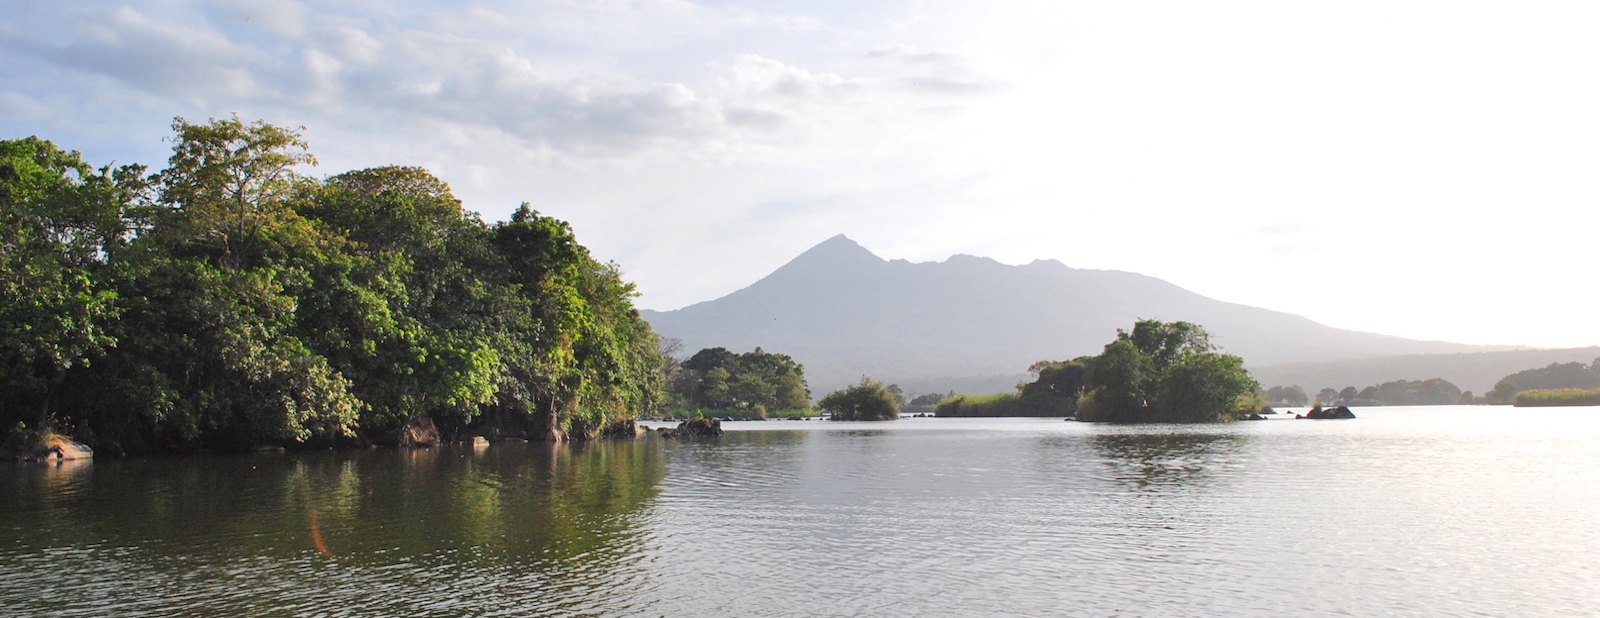 Gold Rush in Nicaragua